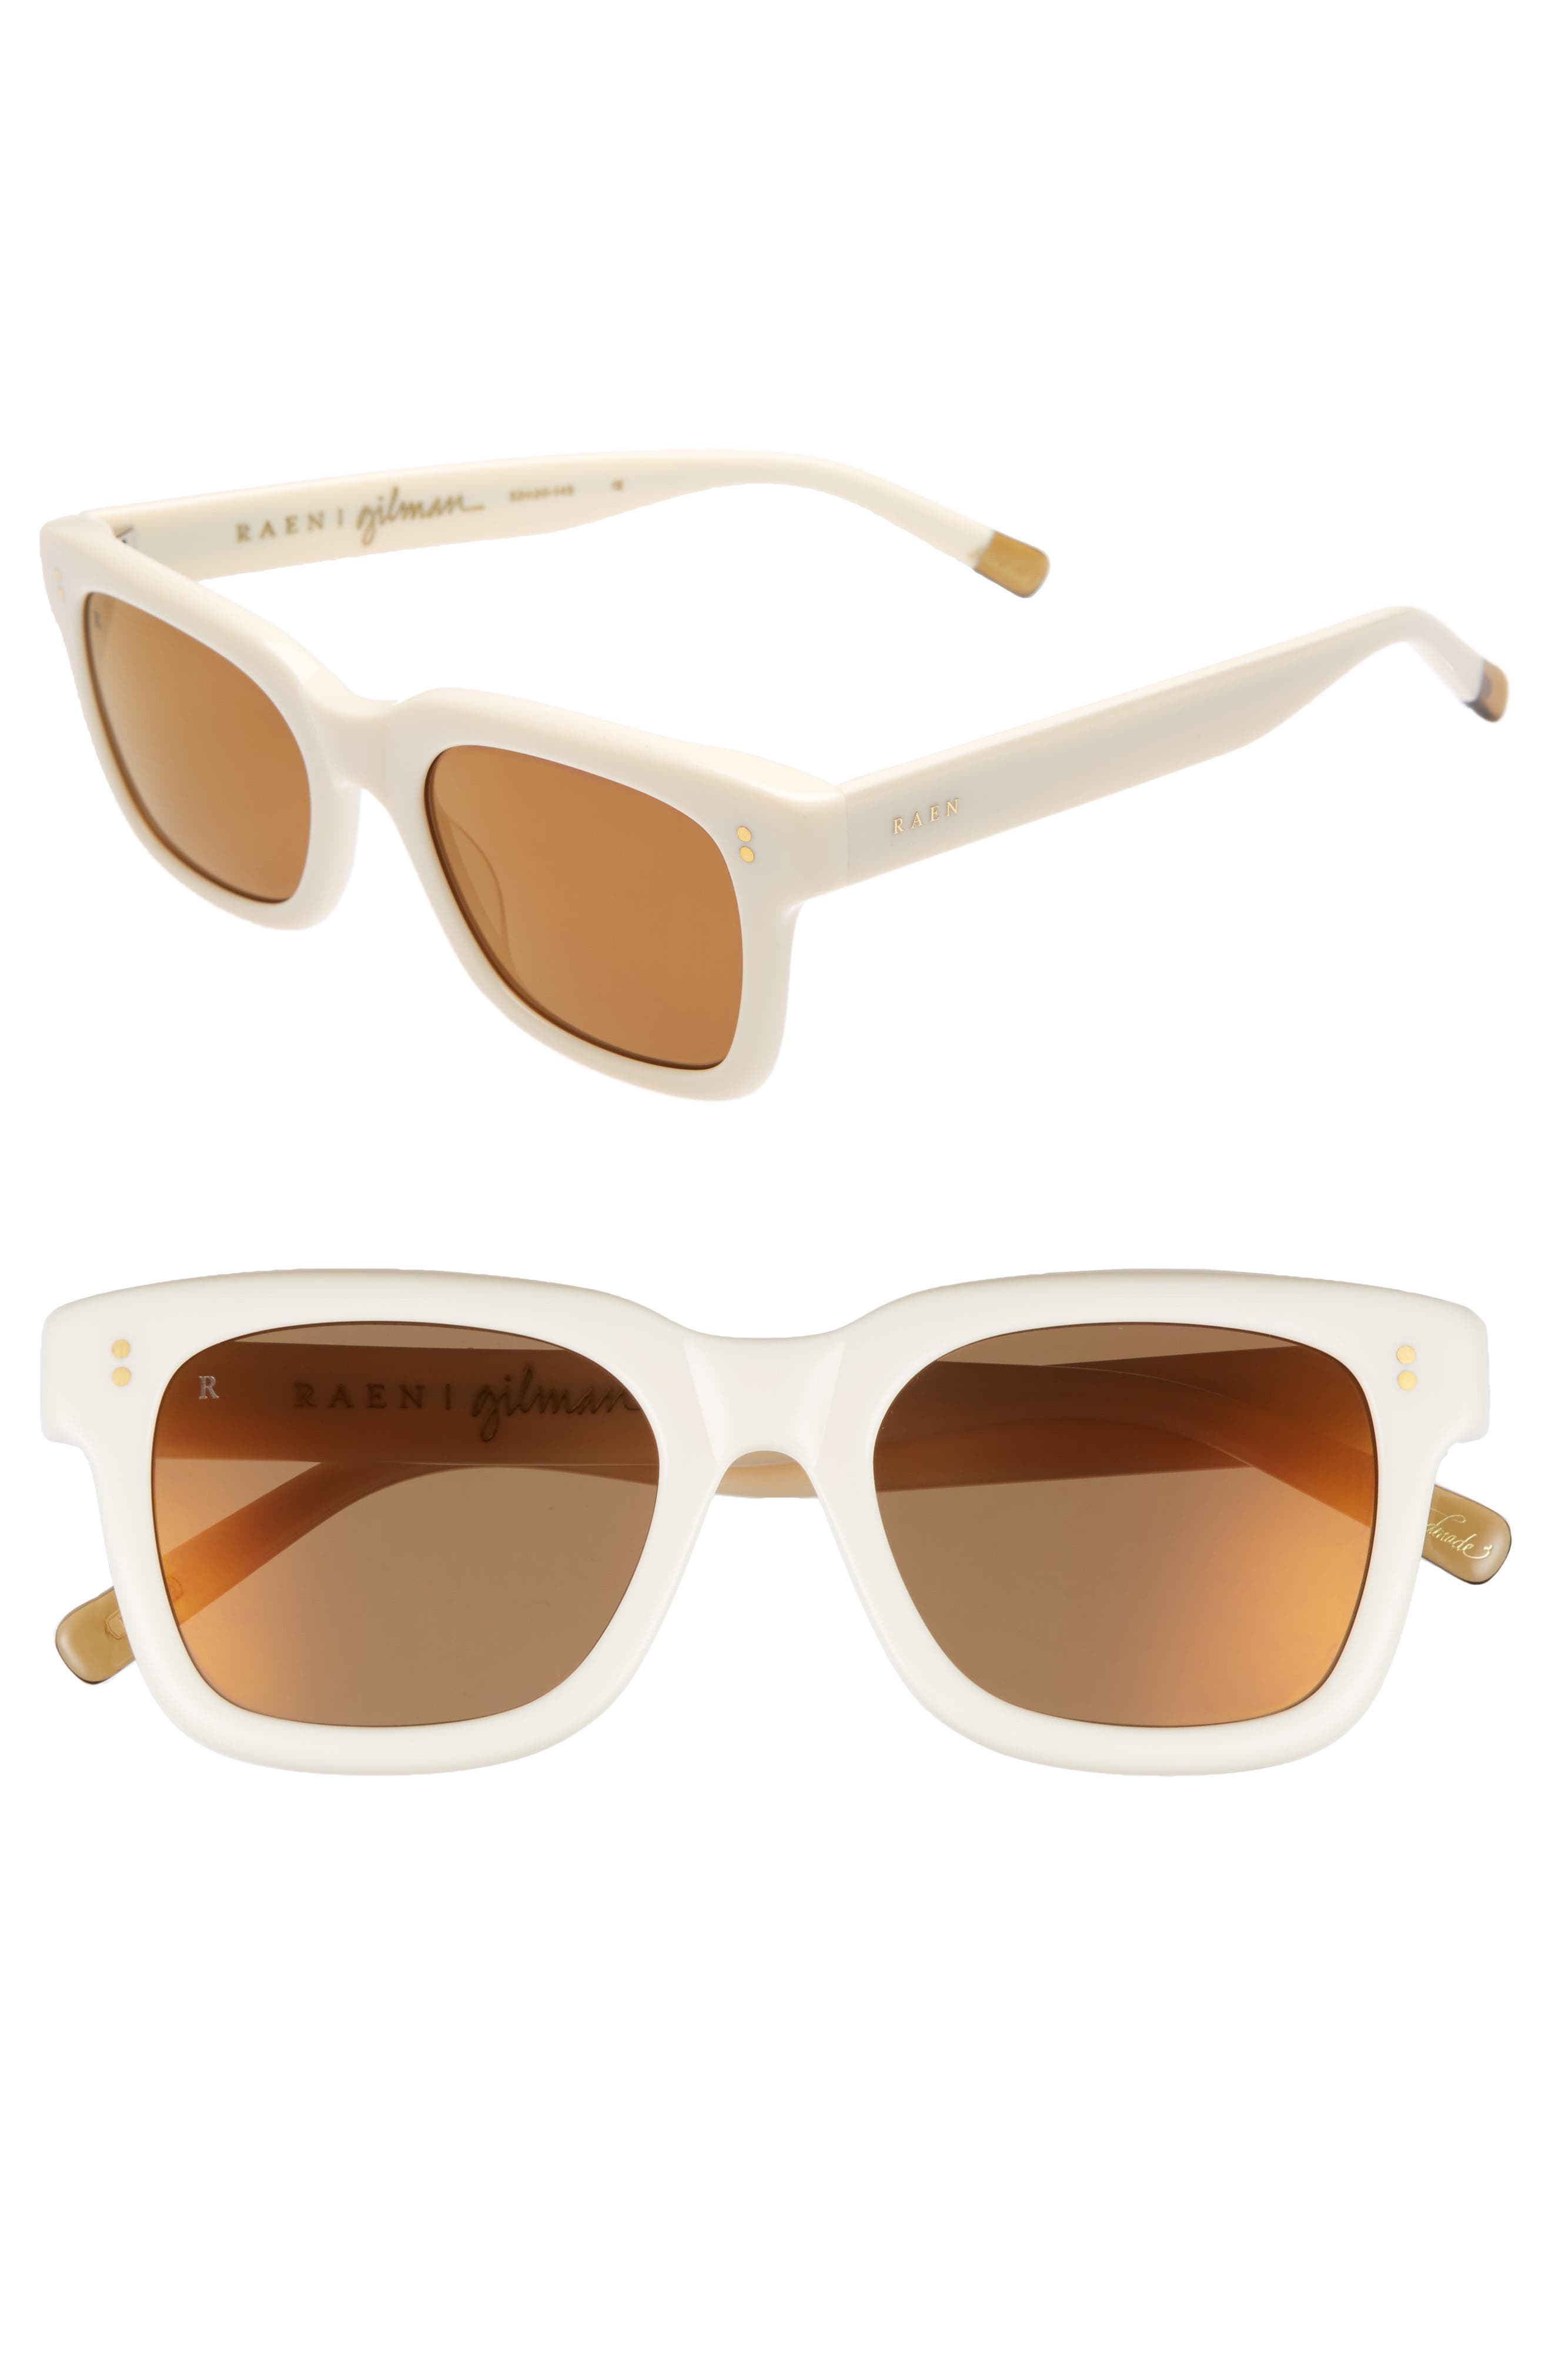 RAEN Gilman 52mm Mirrored Polarized Sunglasses